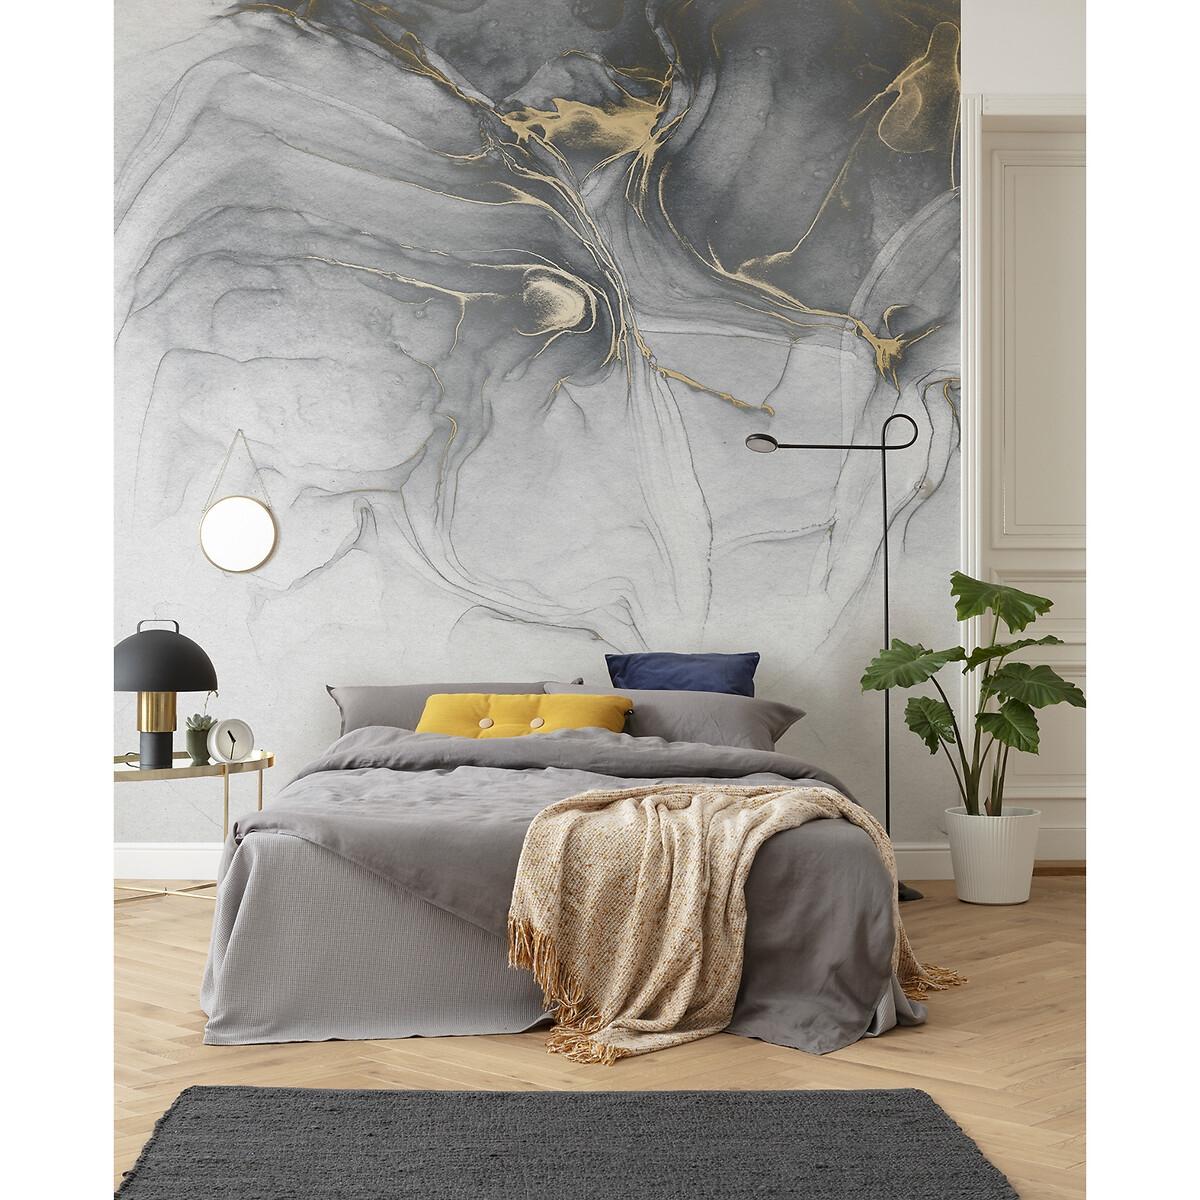 INTERELIFE - Interelife Papel de parede foto mural Ink Gold Fluid, da Interelife